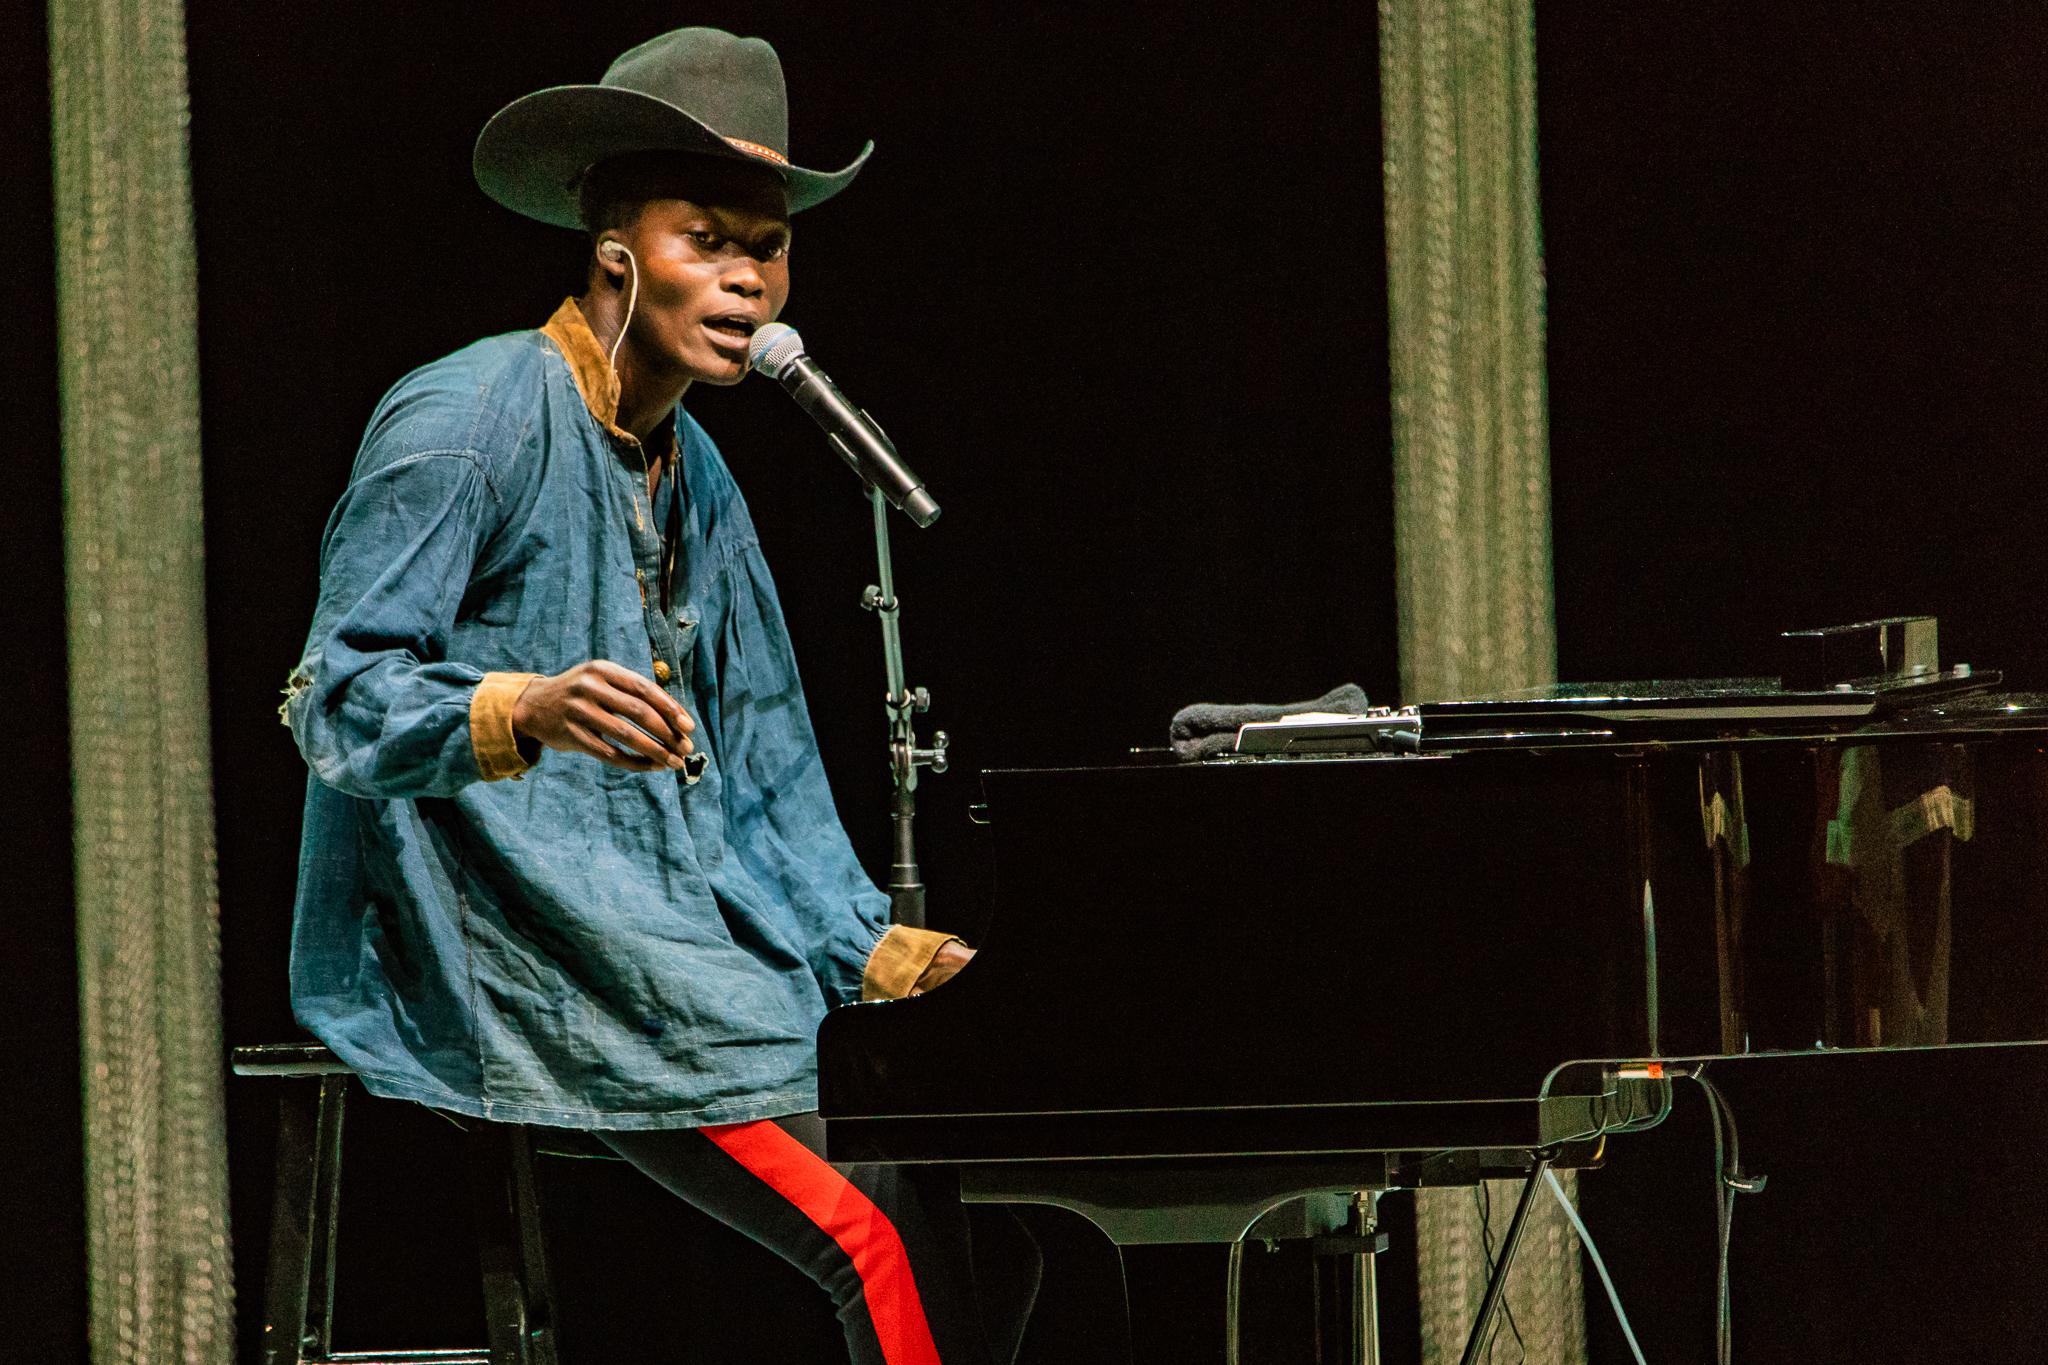 Benjamin Clementine performing at The Anthem in Washington, DC - 5/12/2018 (photo by Matt Condon / @arcane93)